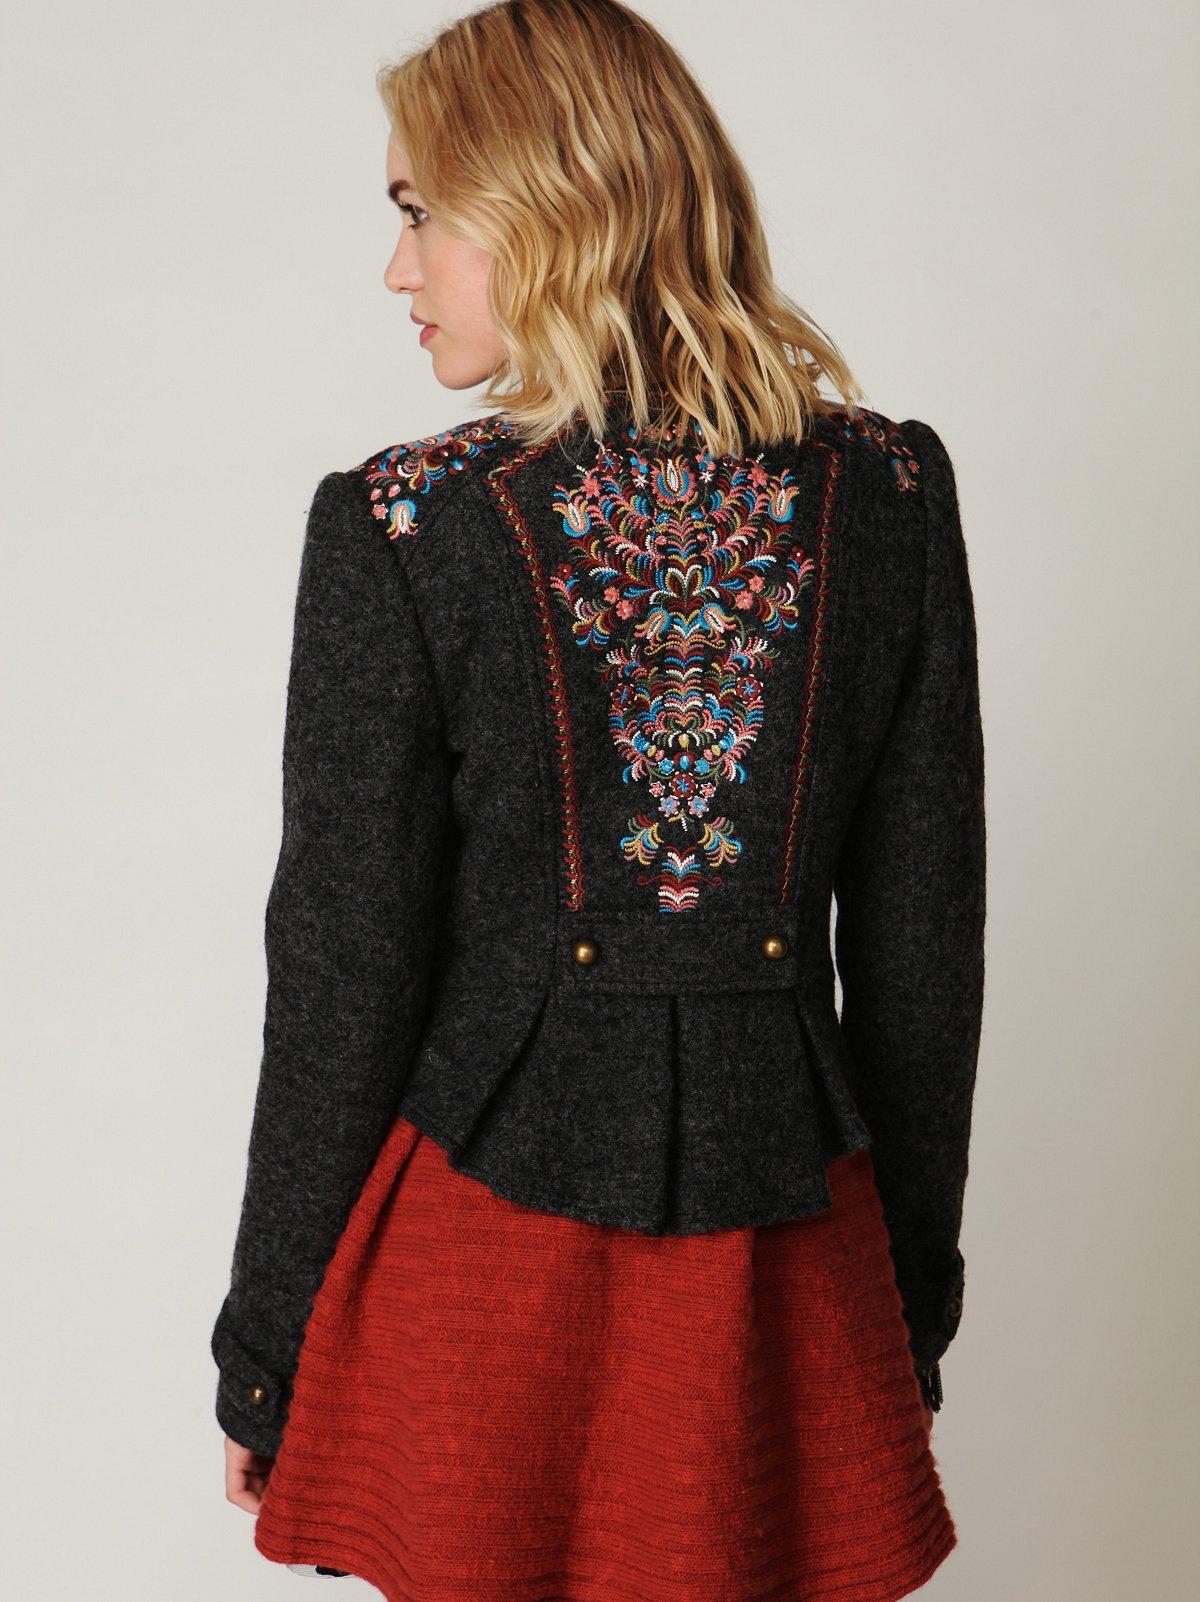 Picchi Embroidered Coat